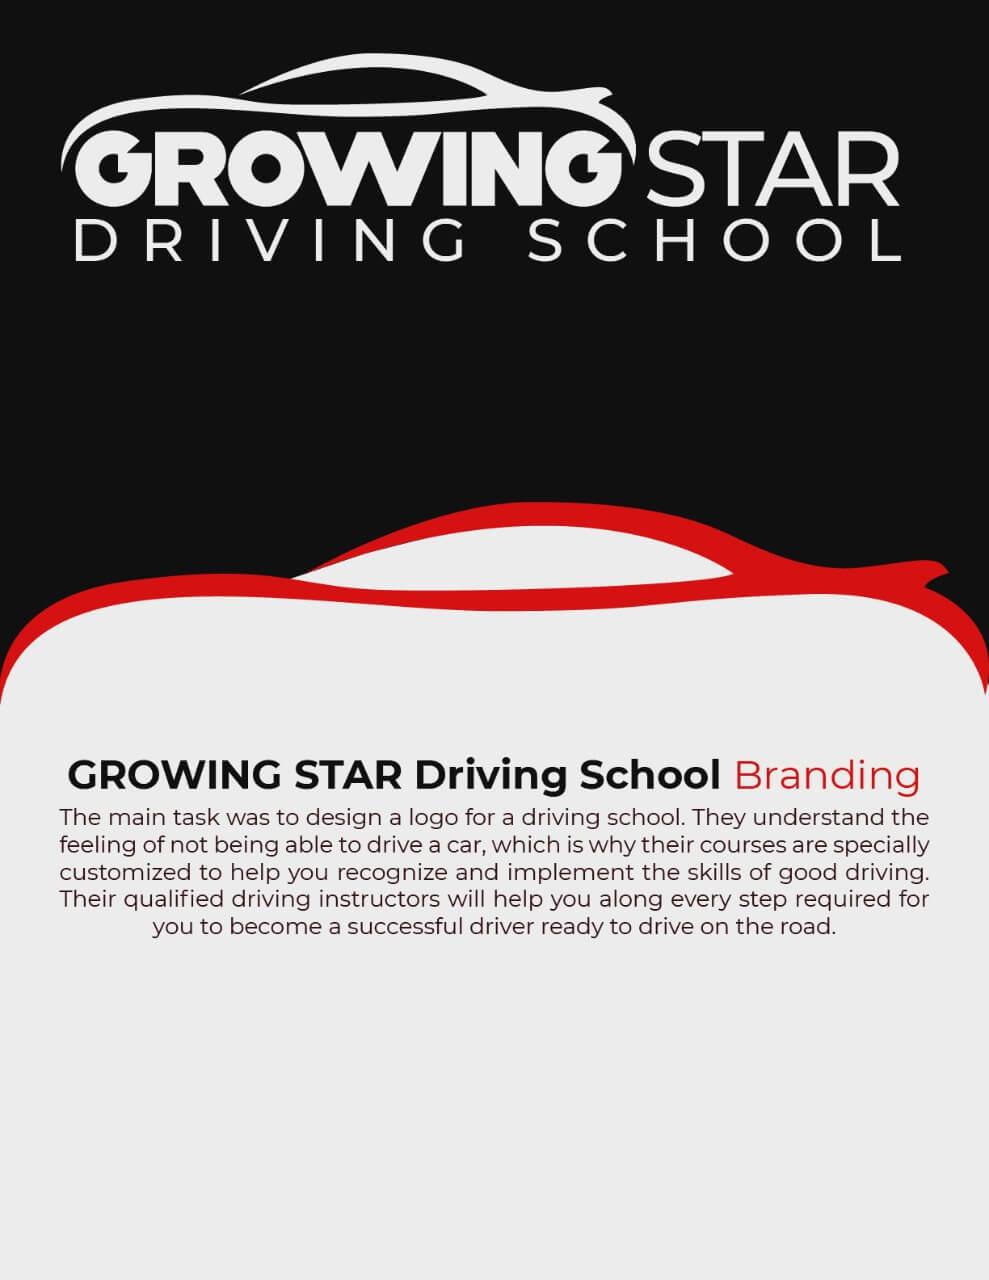 Growing Star Driving school logo